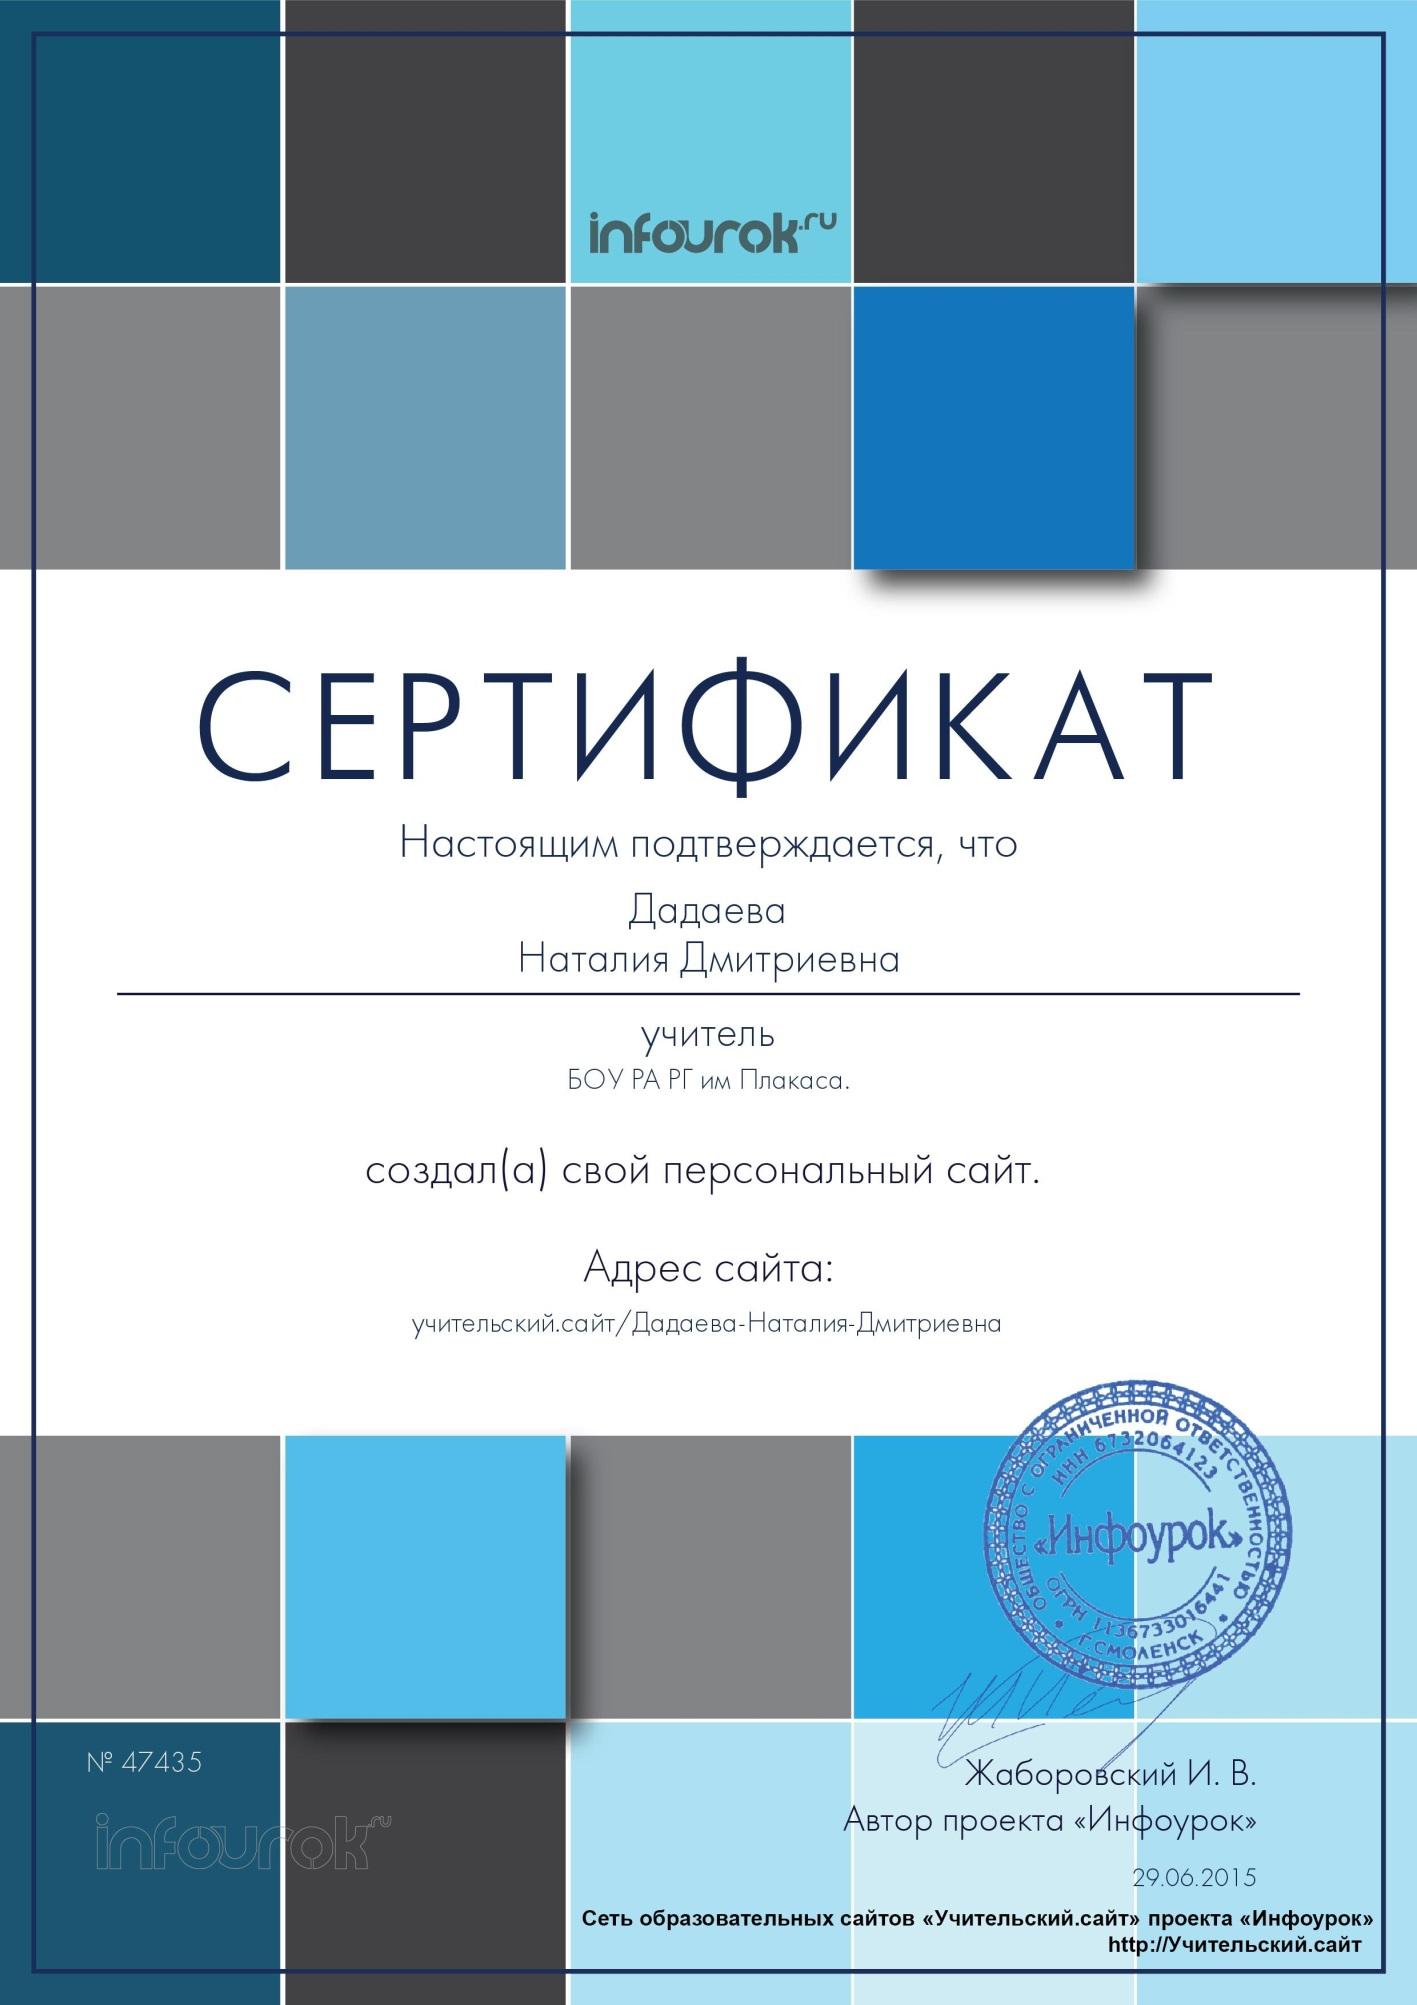 C:\Users\uchenik\Desktop\ДАДАЕВА Н Д\Свидетельства\Сертификат проекта Infourok.ru № 47435.JPG